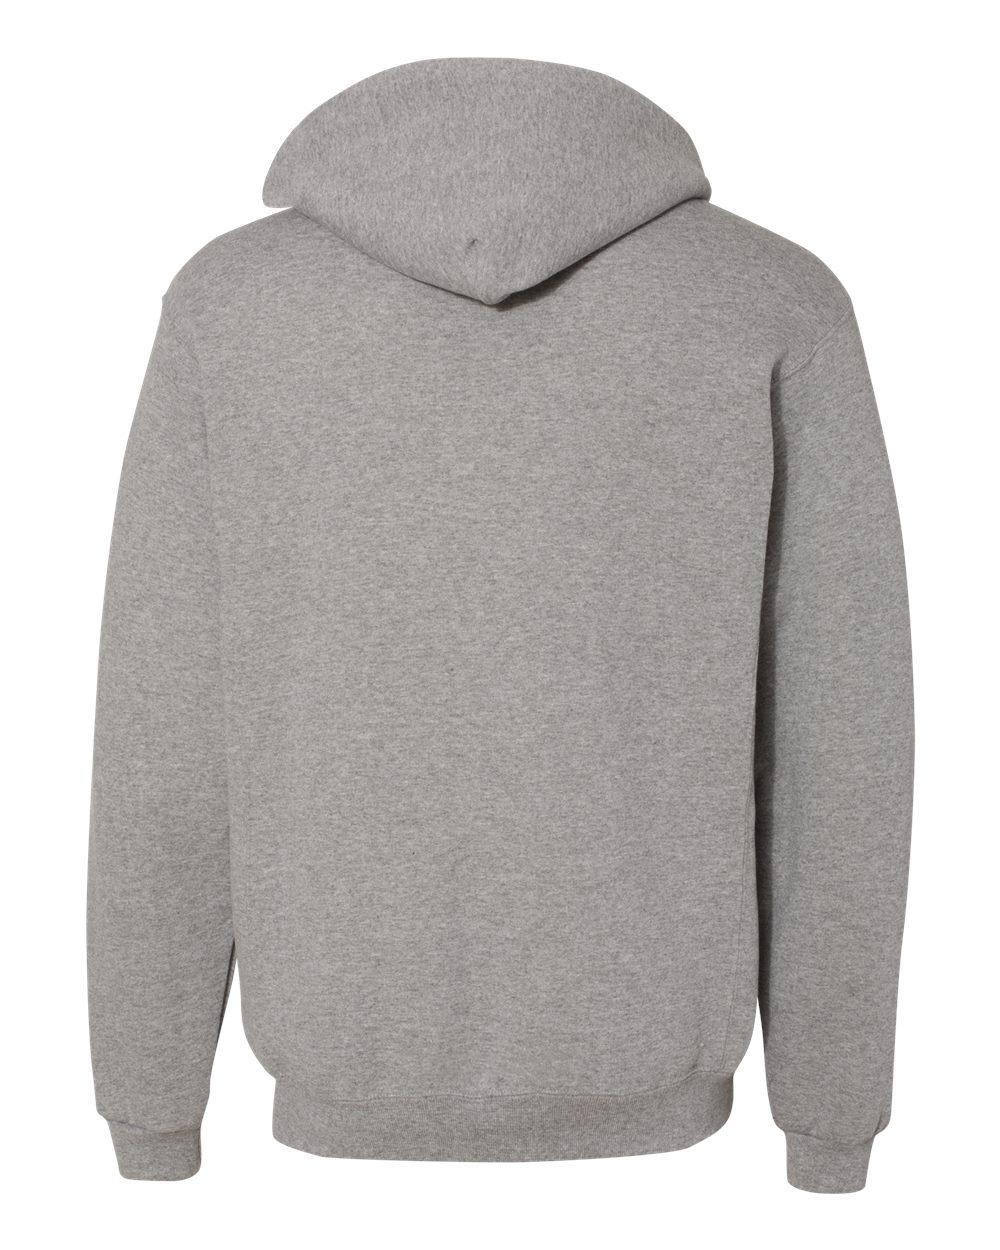 Russell-Athletic-Blank-Plain-Hooded-Full-Zip-Sweatshirt-697HBM-up-to-3XL thumbnail 13